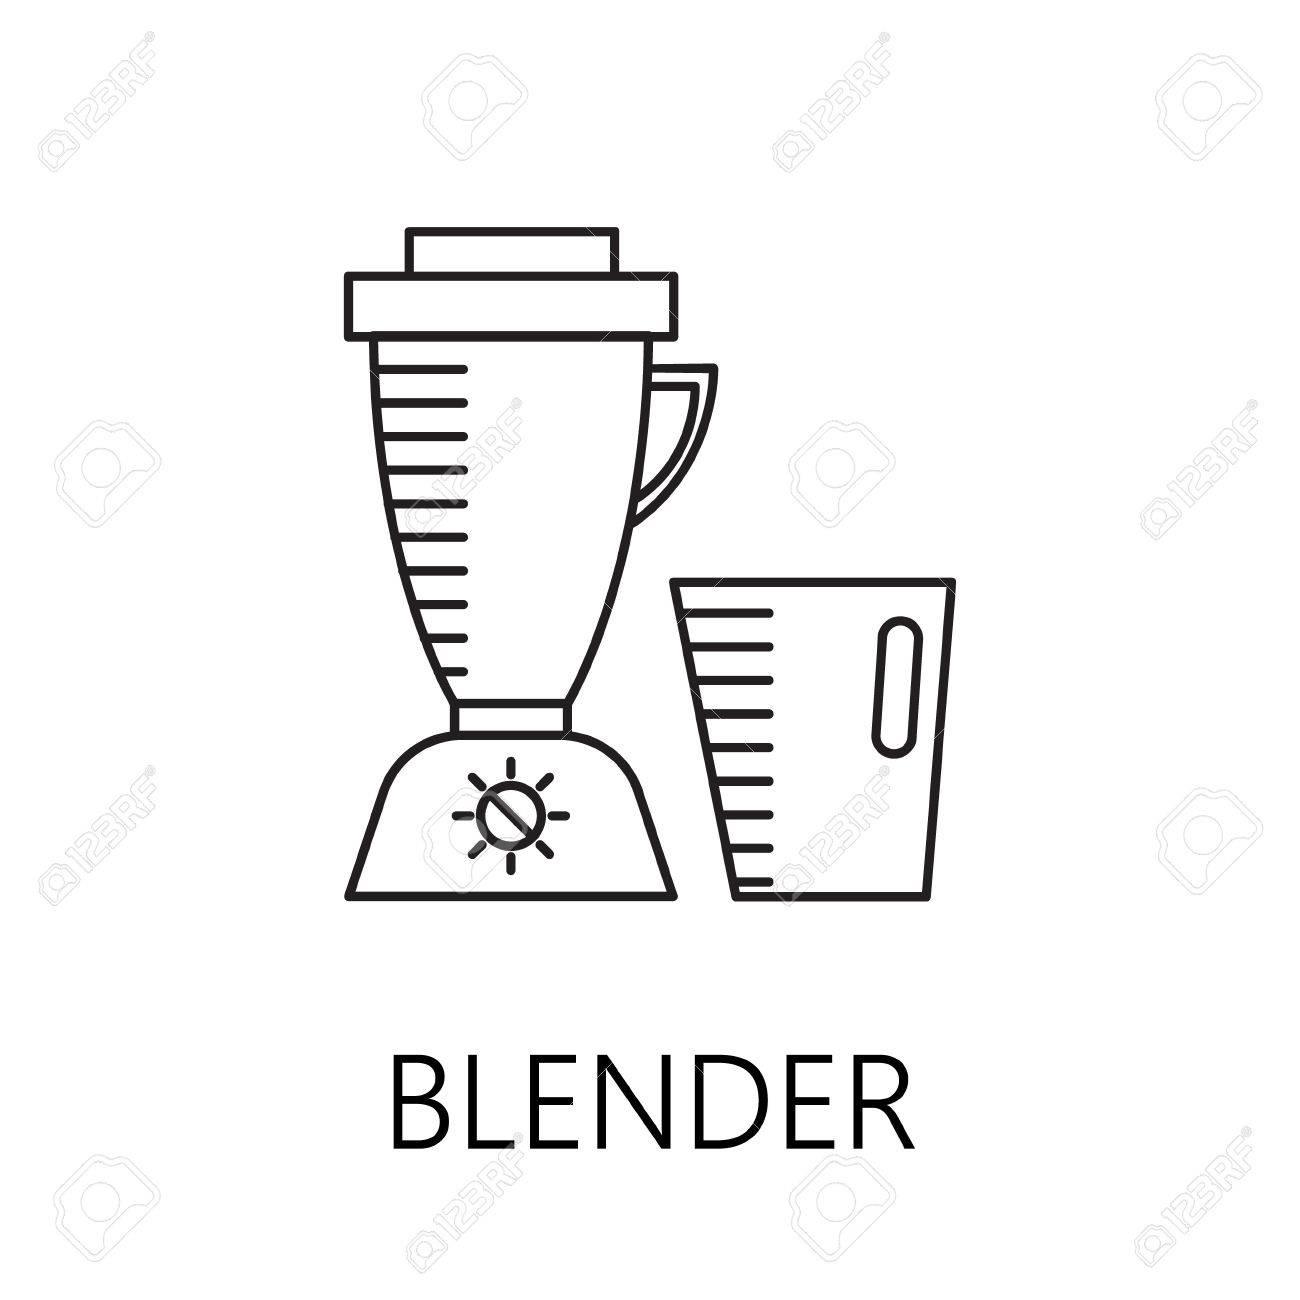 Blender-Linie-Symbol. Vektor-Symbol Zum Thema Home Elektronische ...